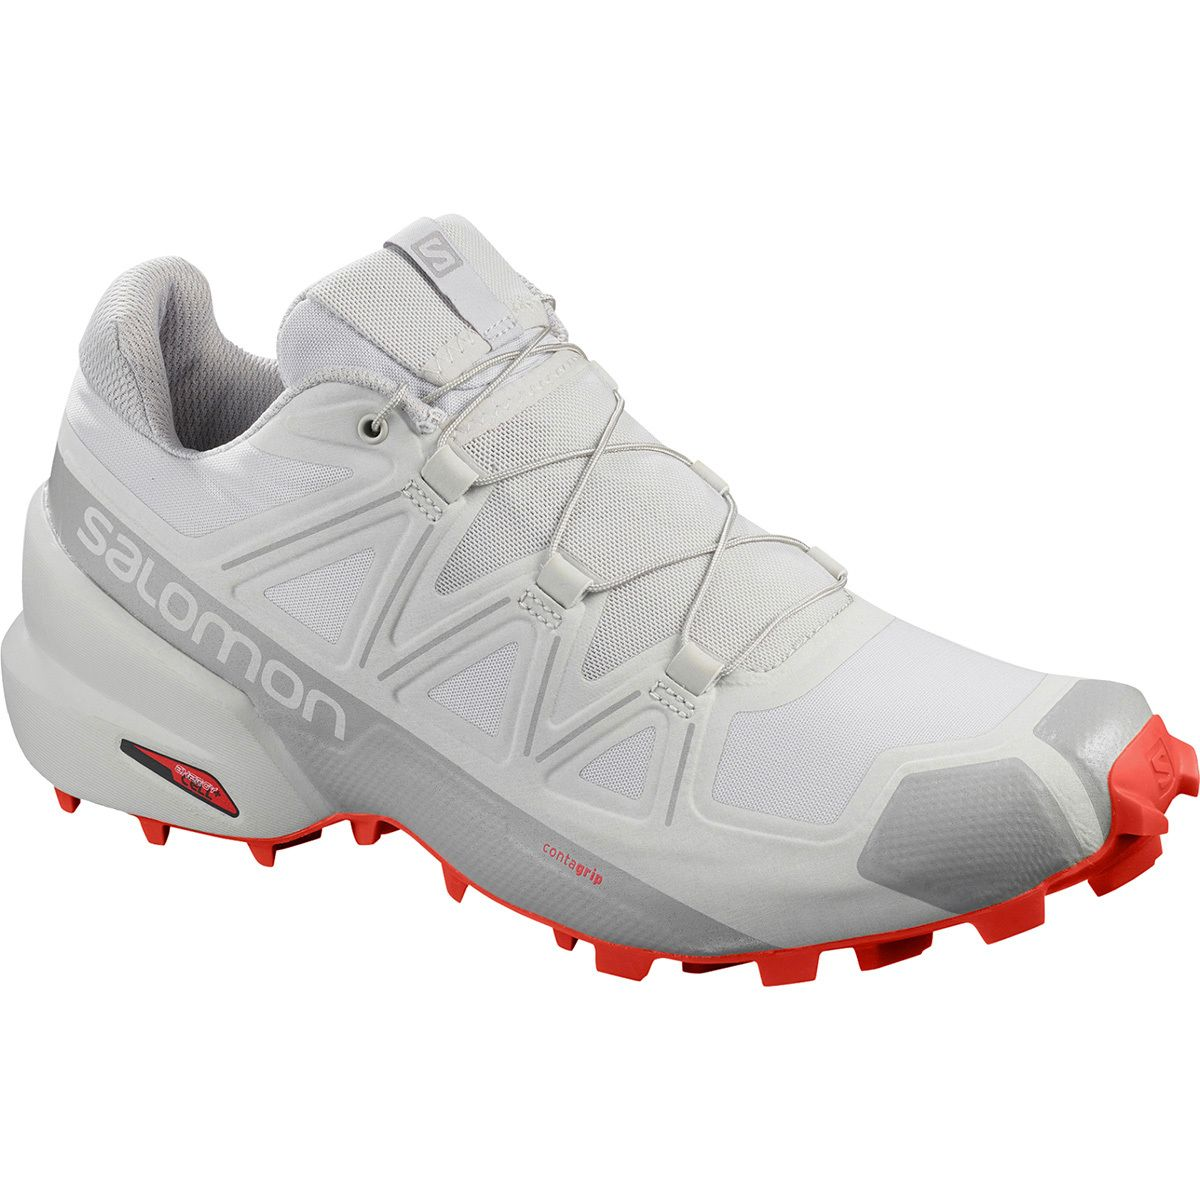 Salomon Speedcross 5 Trail Running Shoe Men's